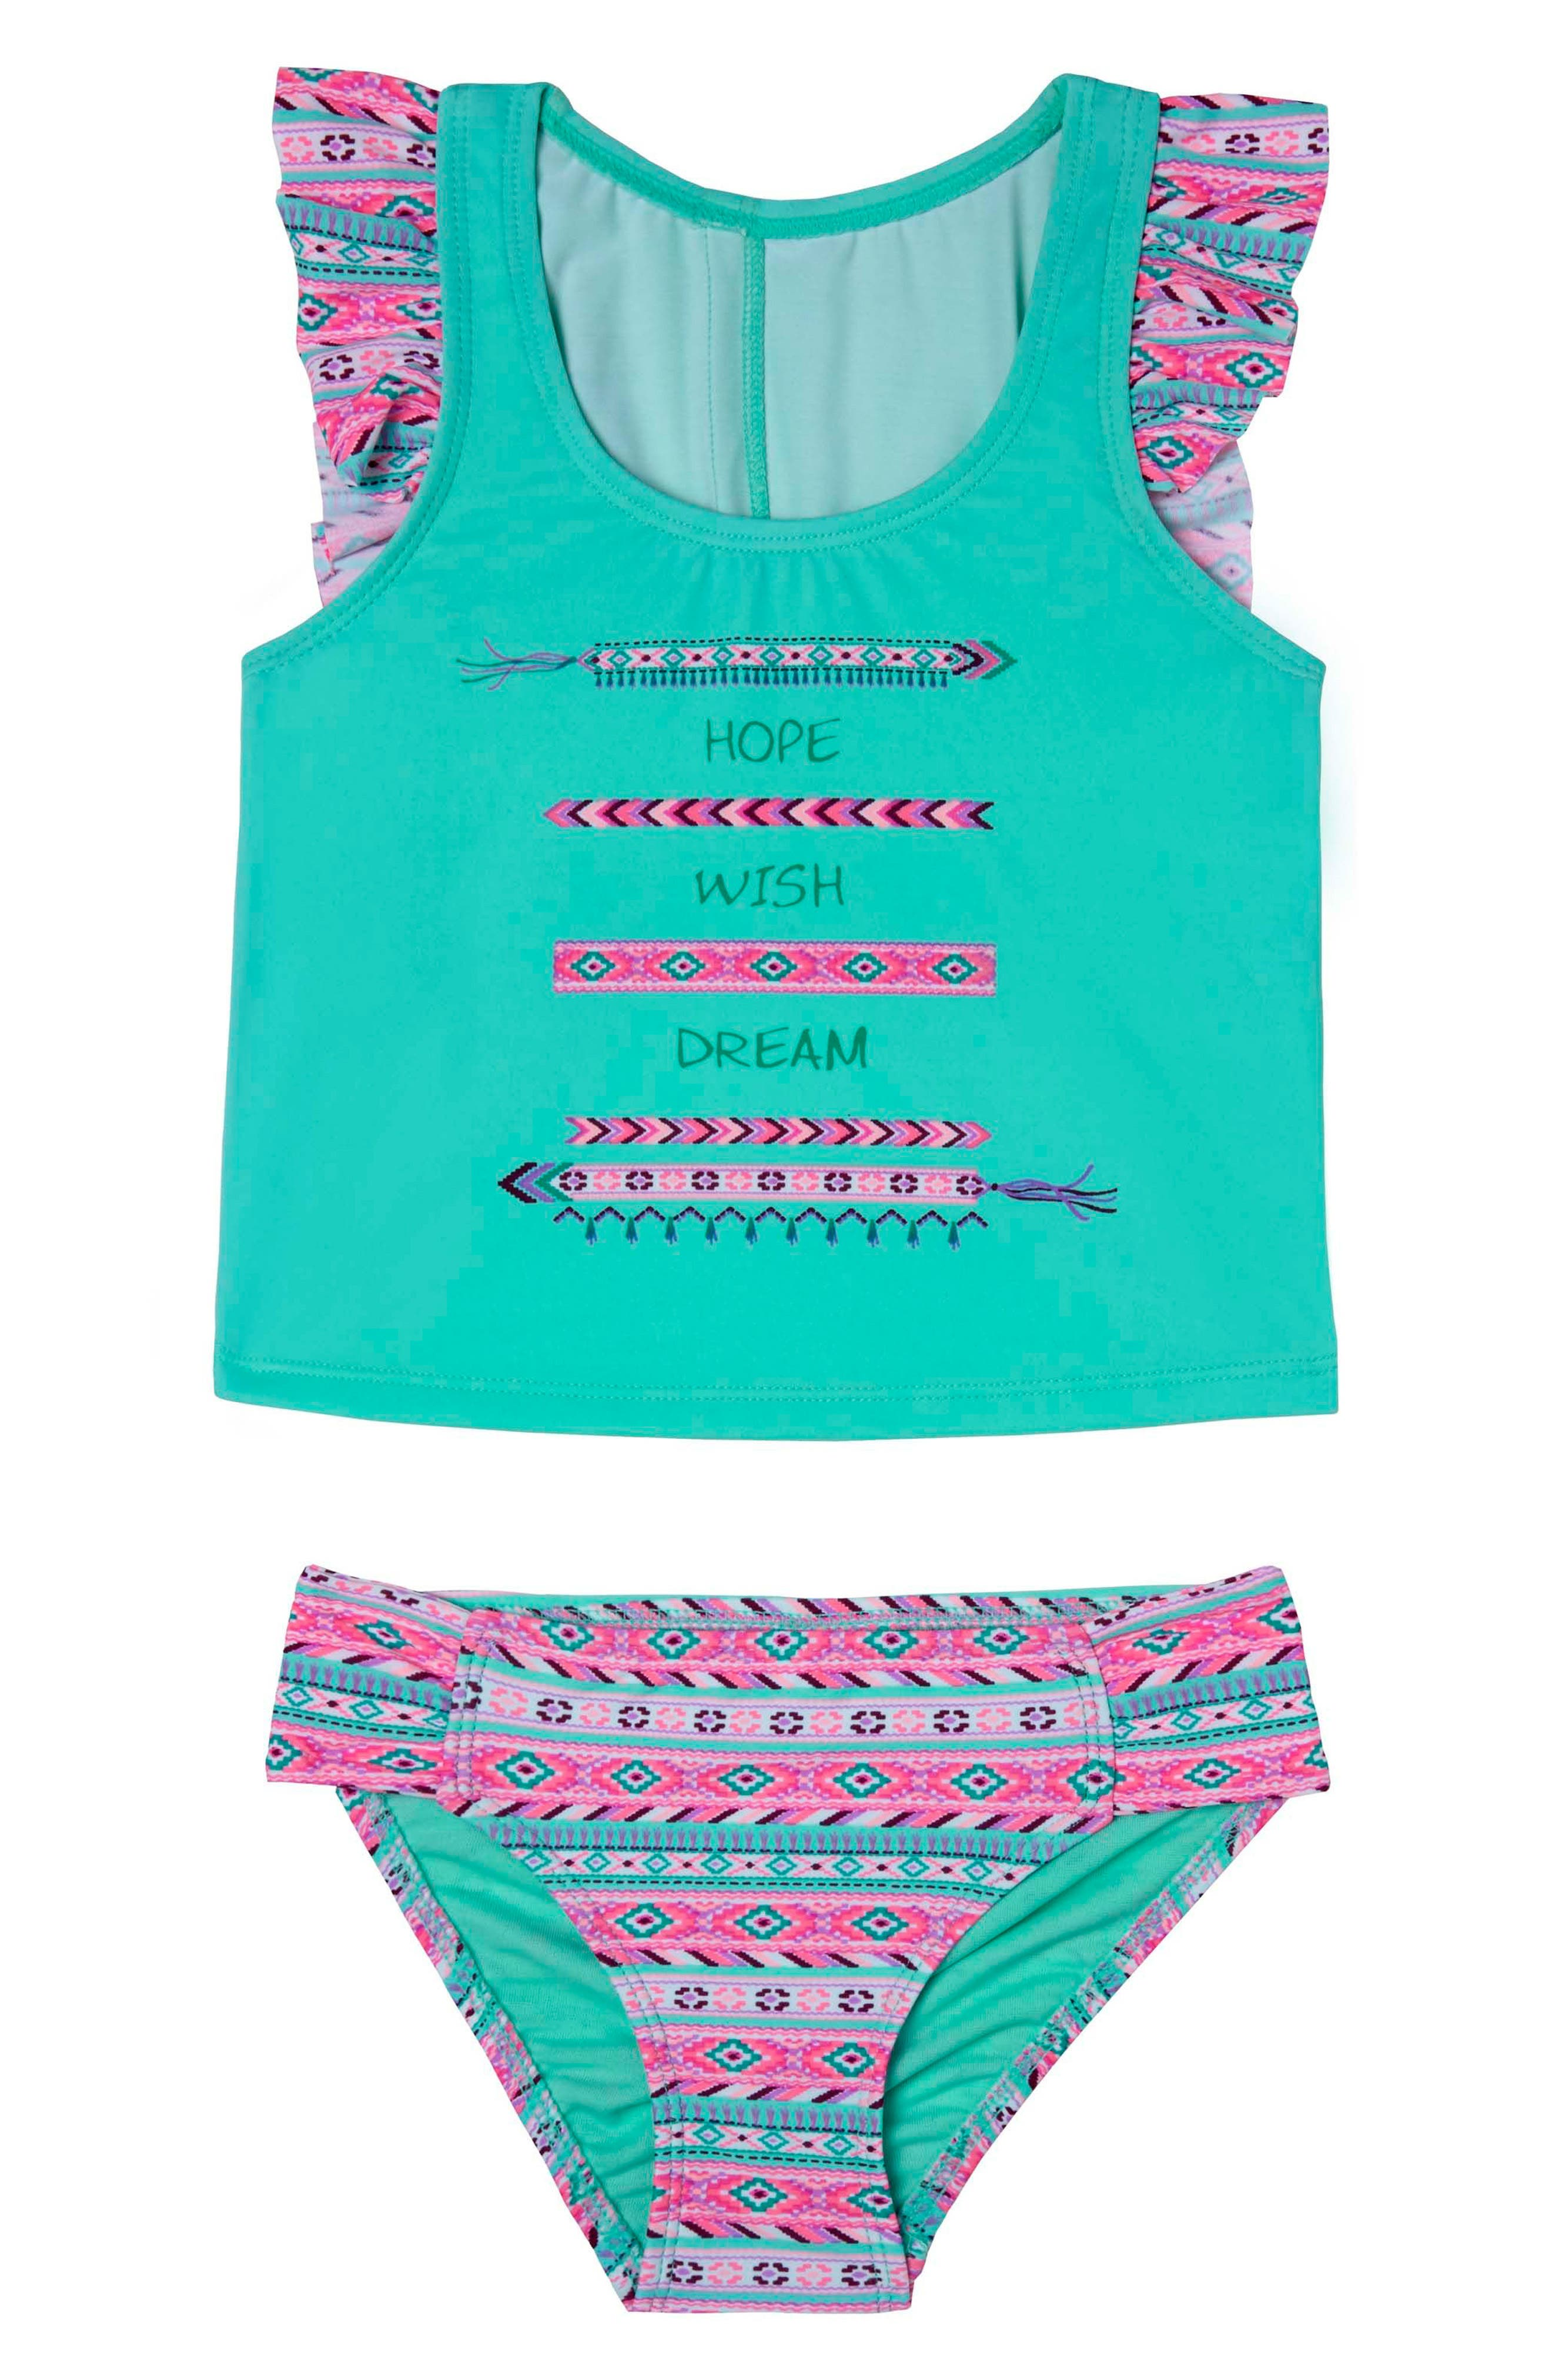 Main Image - Hula Star BFF - Hope, Wish & Dream Two-Piece Tankini Swimsuit (Toddler Girls & Little Girls)